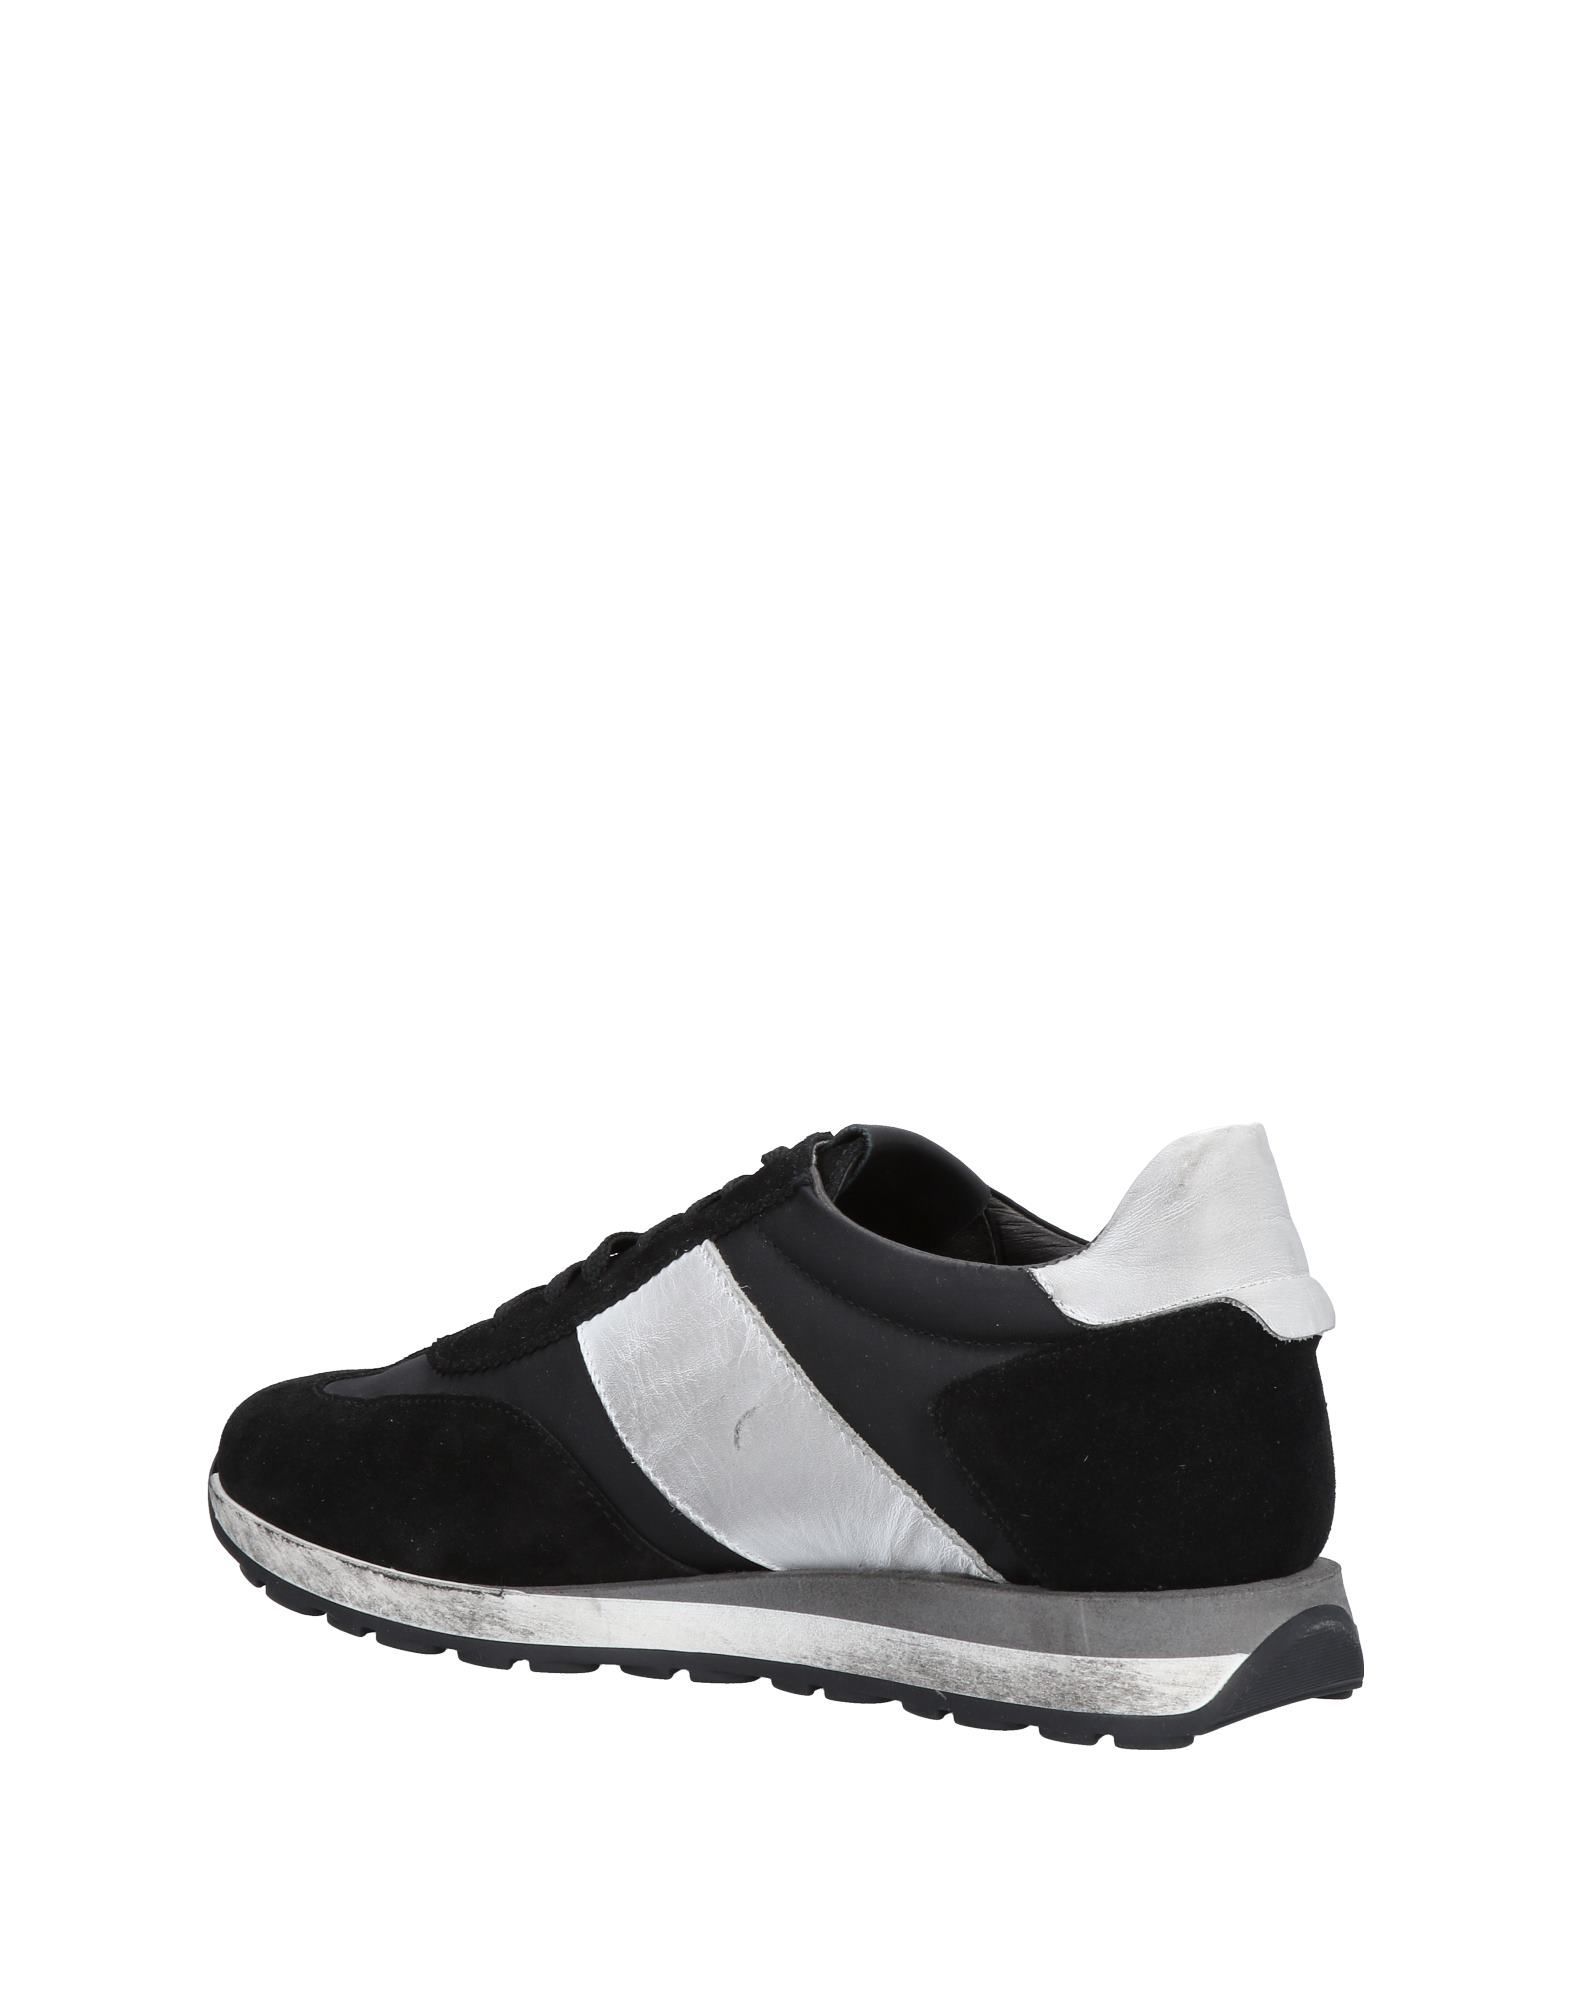 Daniele Alessandrini Sneakers - Men Daniele  Alessandrini Sneakers online on  Daniele Australia - 11473145MP c09c2a